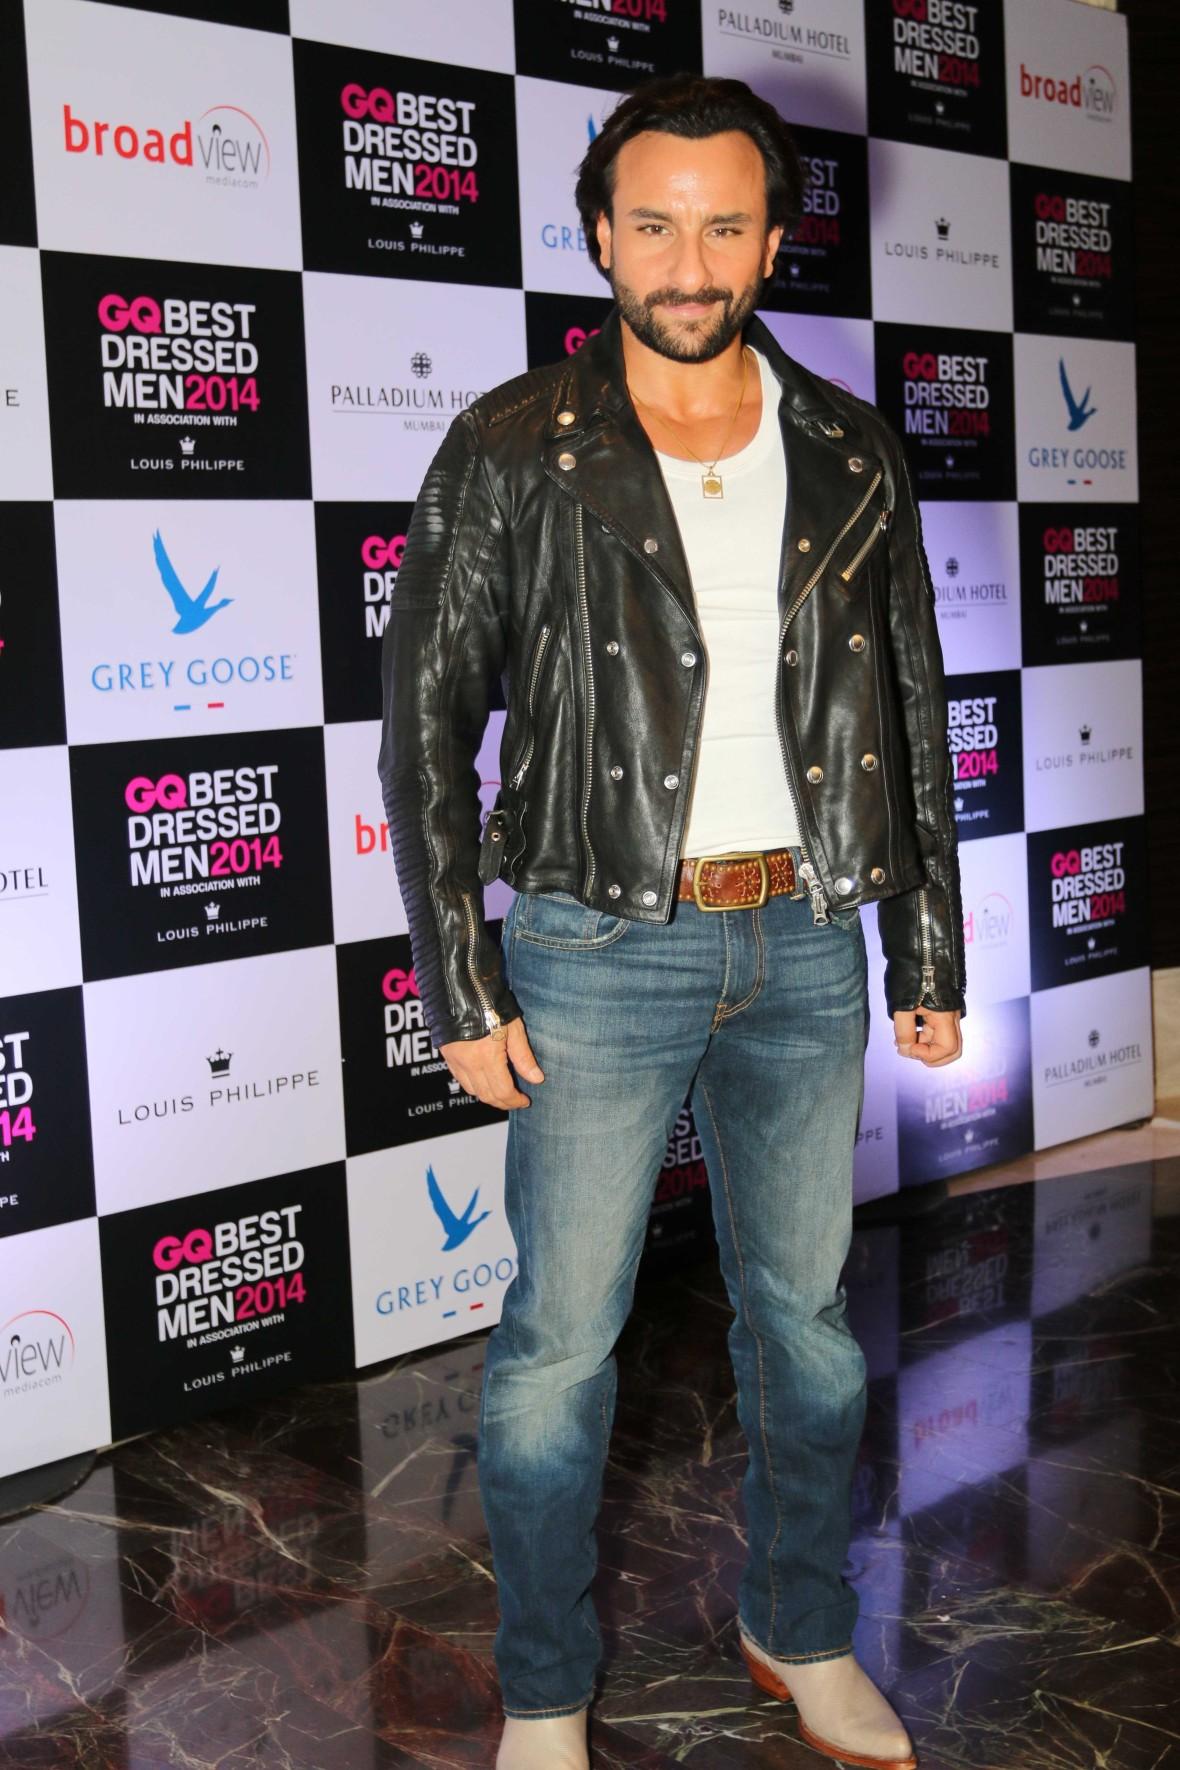 Saif Ali Khan at GQ Best Dressed Men 2014